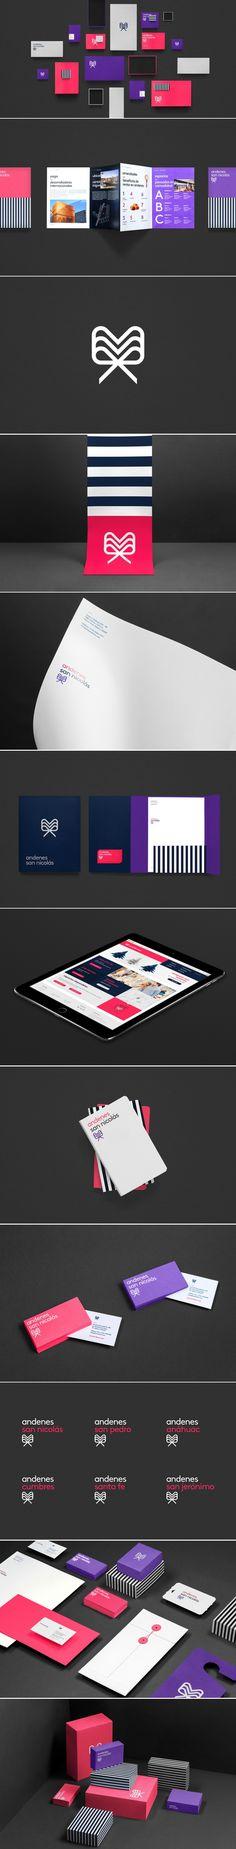 Andenes — The Dieline | Packaging & Branding Design & Innovation News